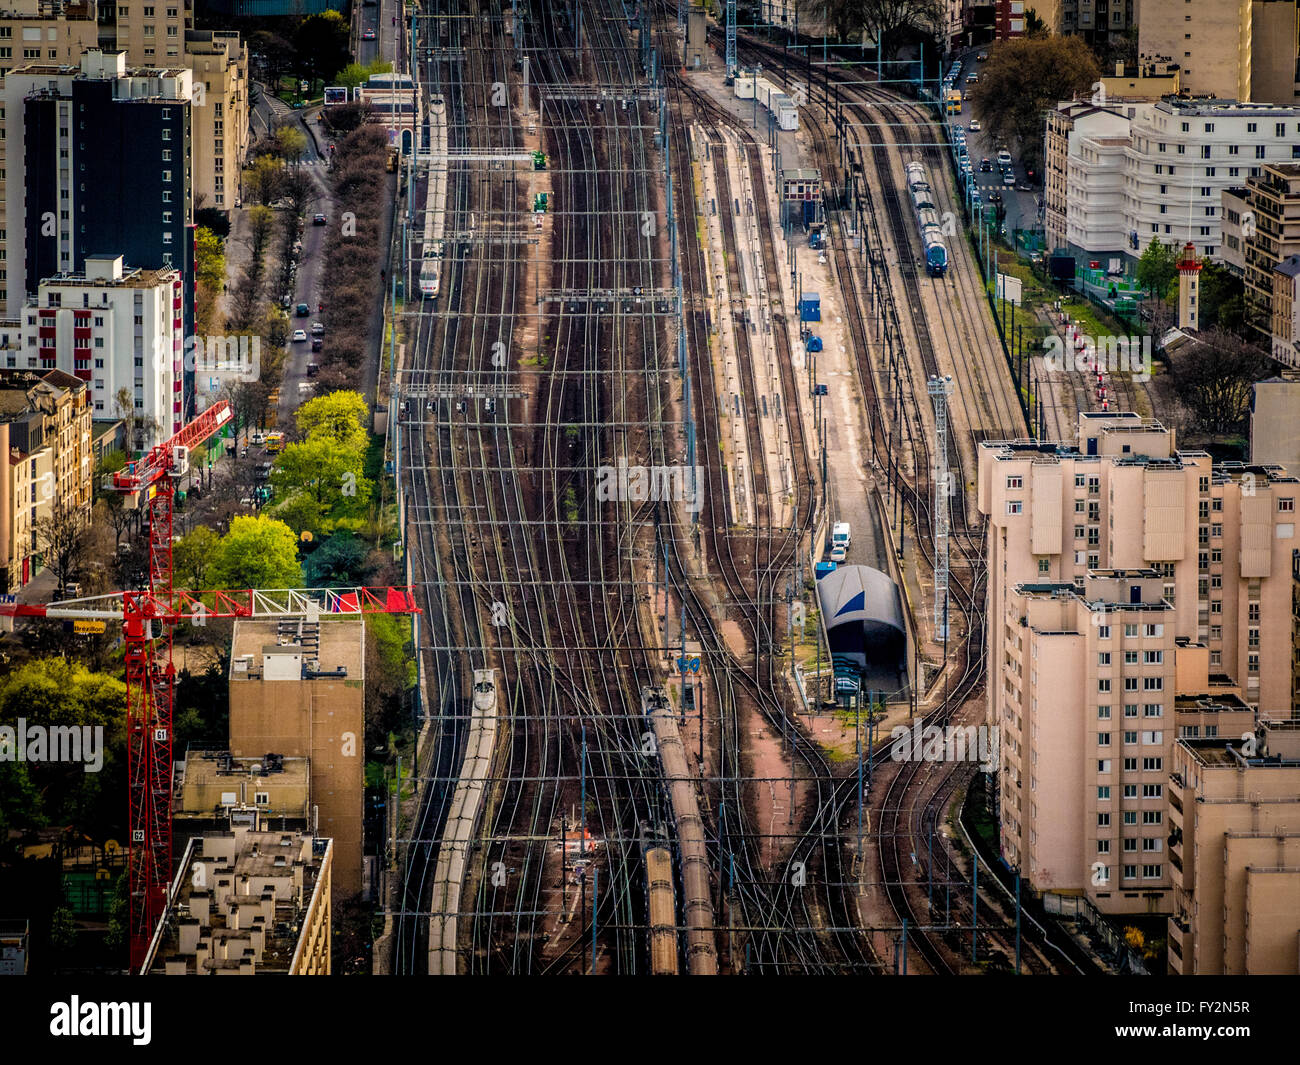 Railway tracks leading into Gare Montparnasse, Paris, France - Stock Image